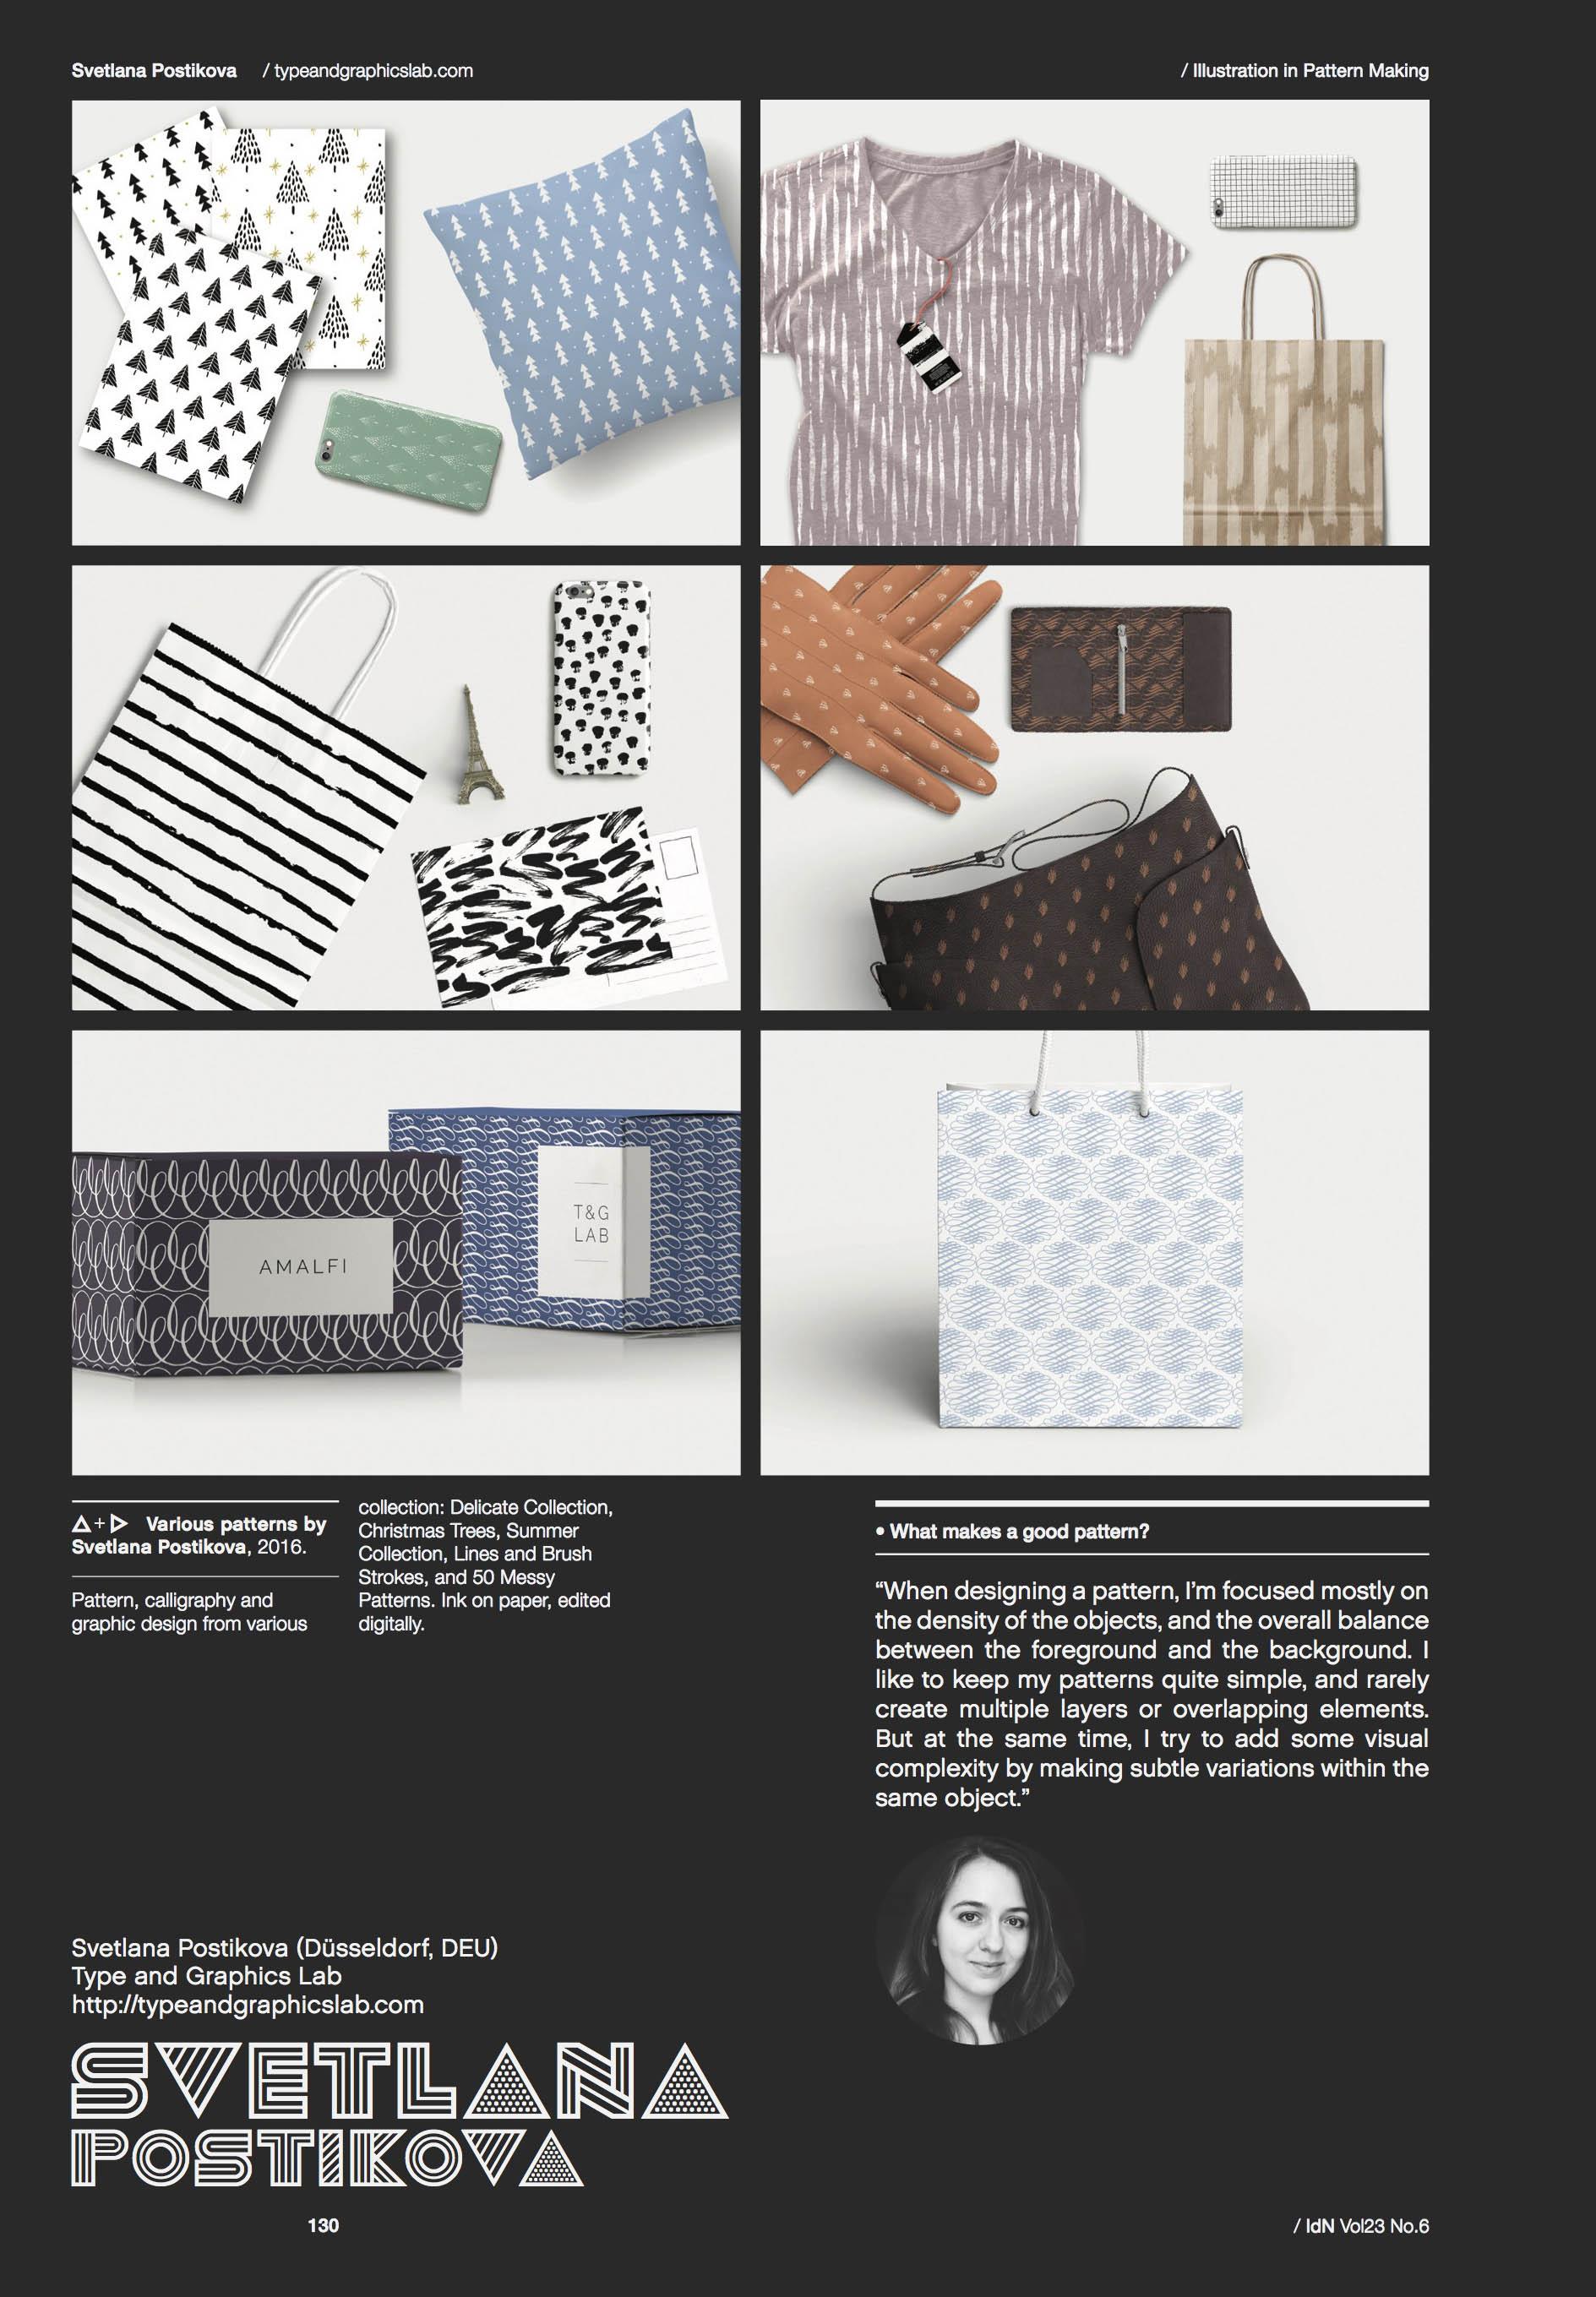 The spread with Svetlana Postikova's work from IdN Magazine v23n6: Illustration in Pattern Making.